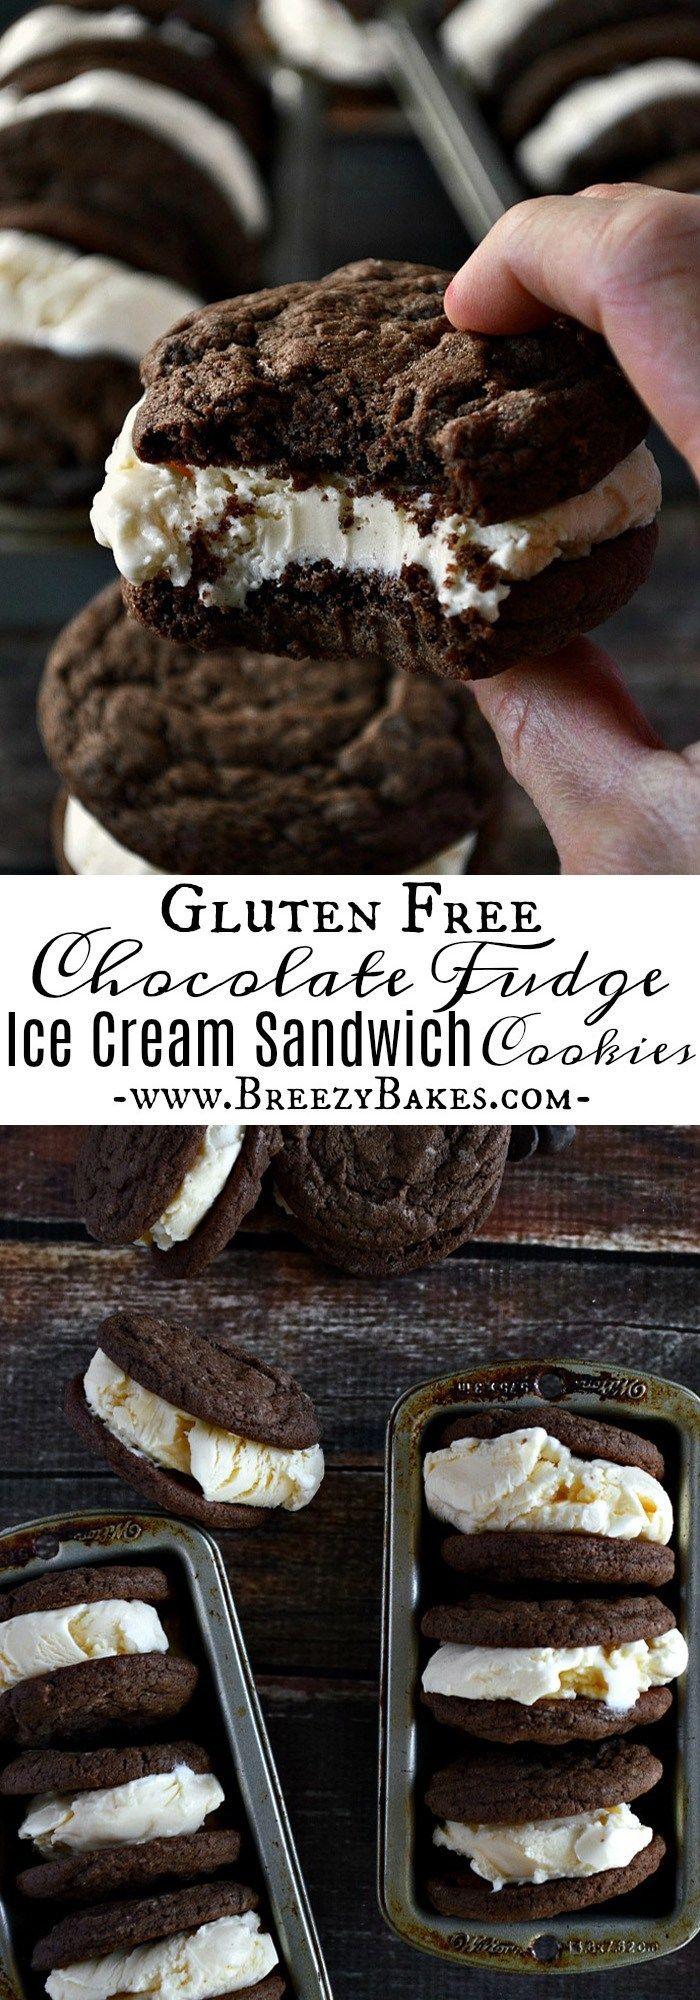 Gluten Free Ice Cream Sandwich Cookies - Breezy Bakes #icecreamsandwich